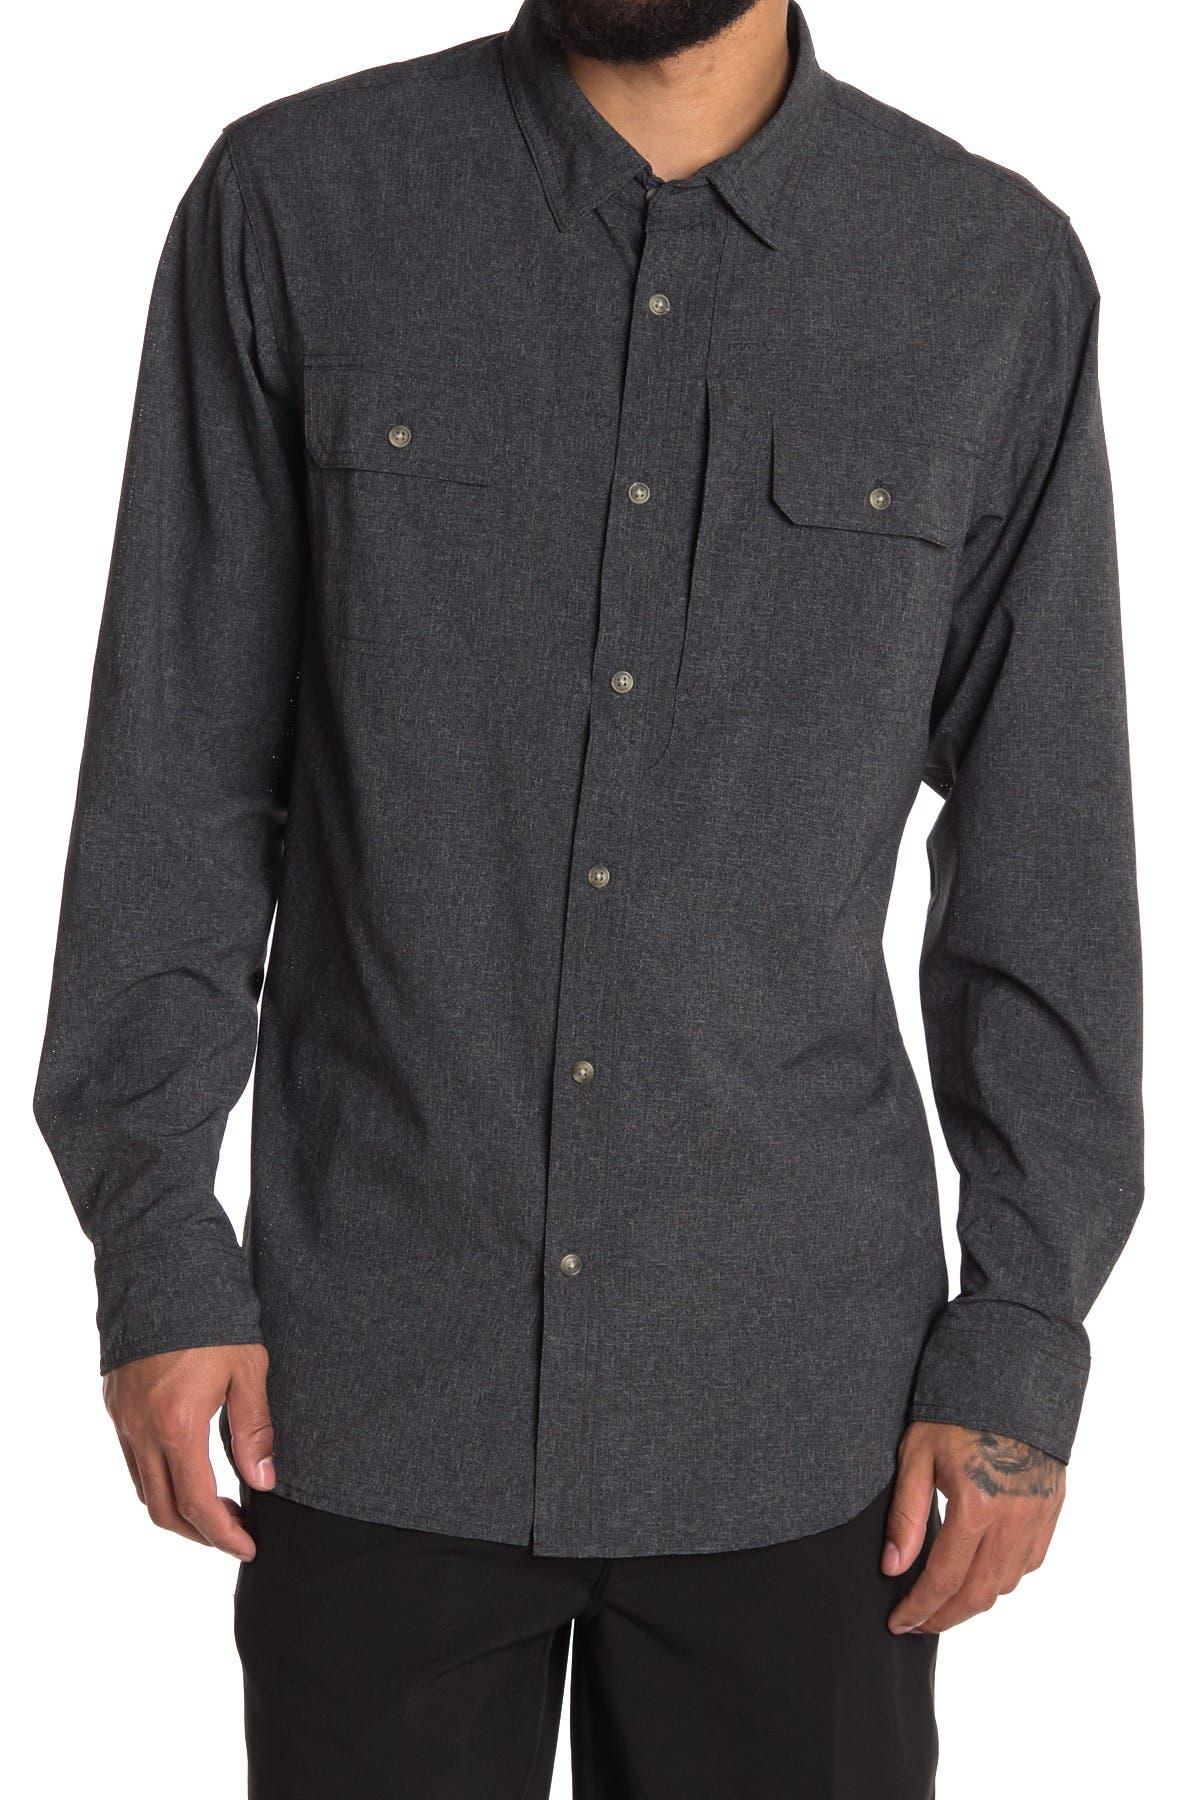 Image of UNION DENIM Aero Tech Long Sleeve Shirt